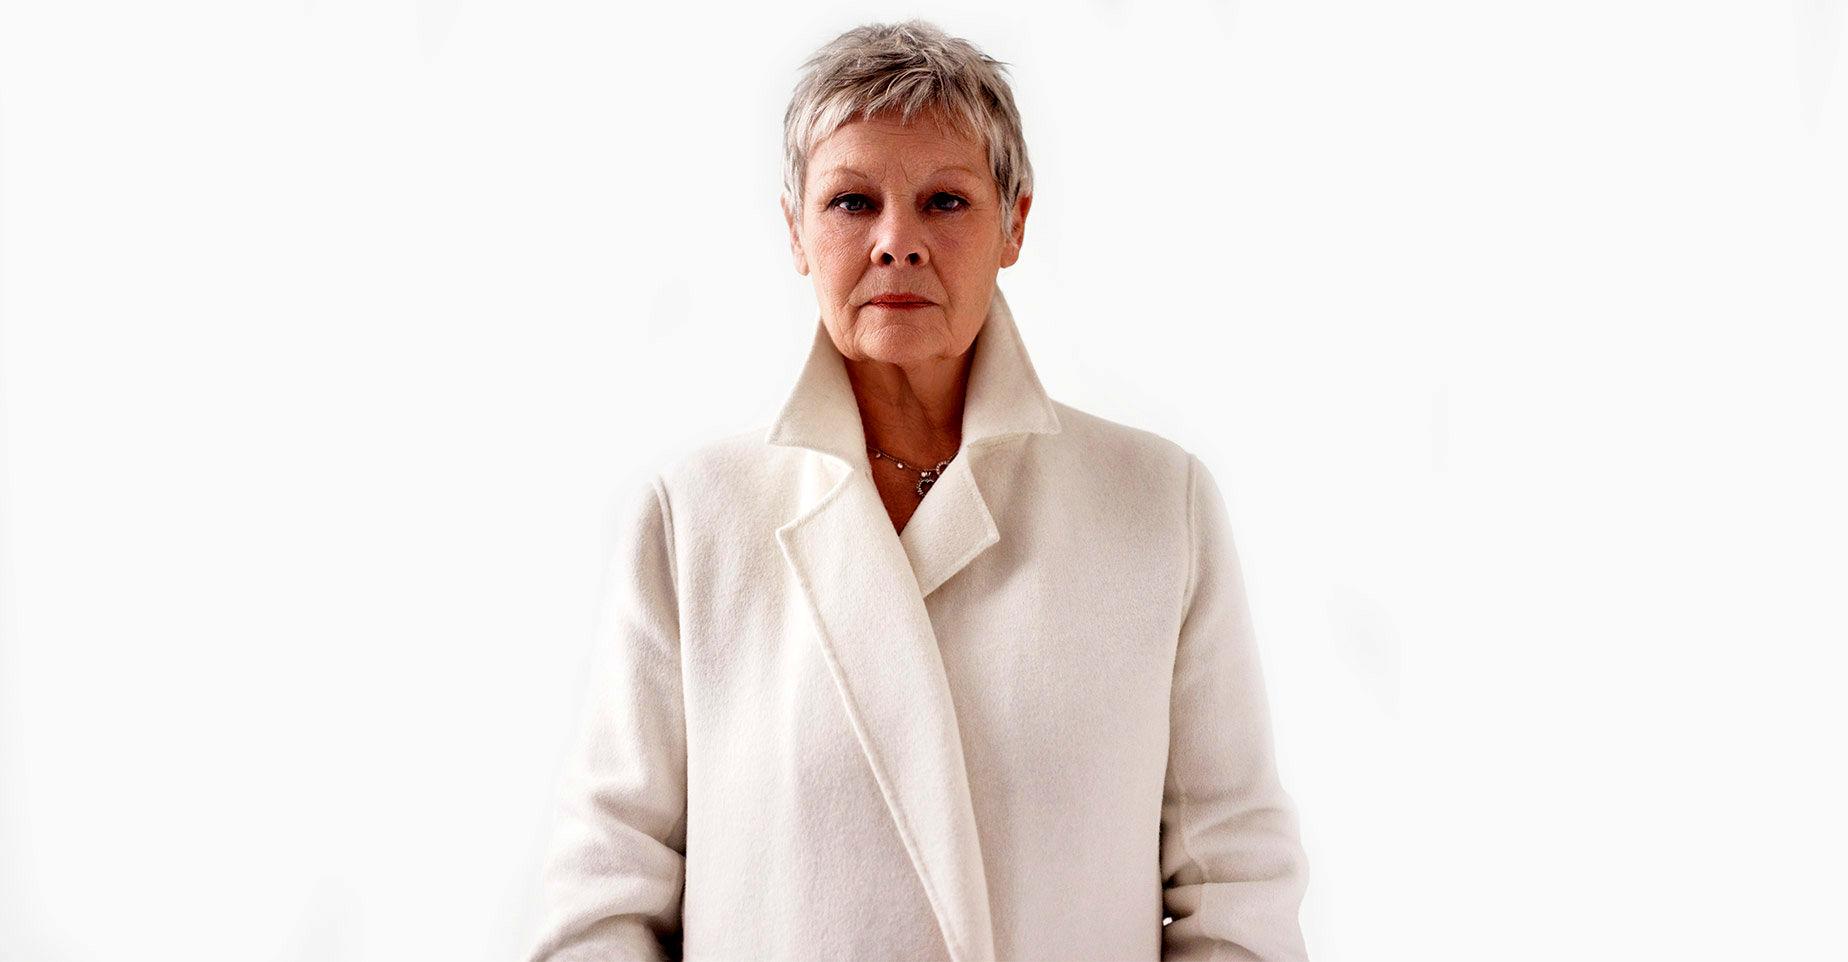 Judi Dench | The Talks